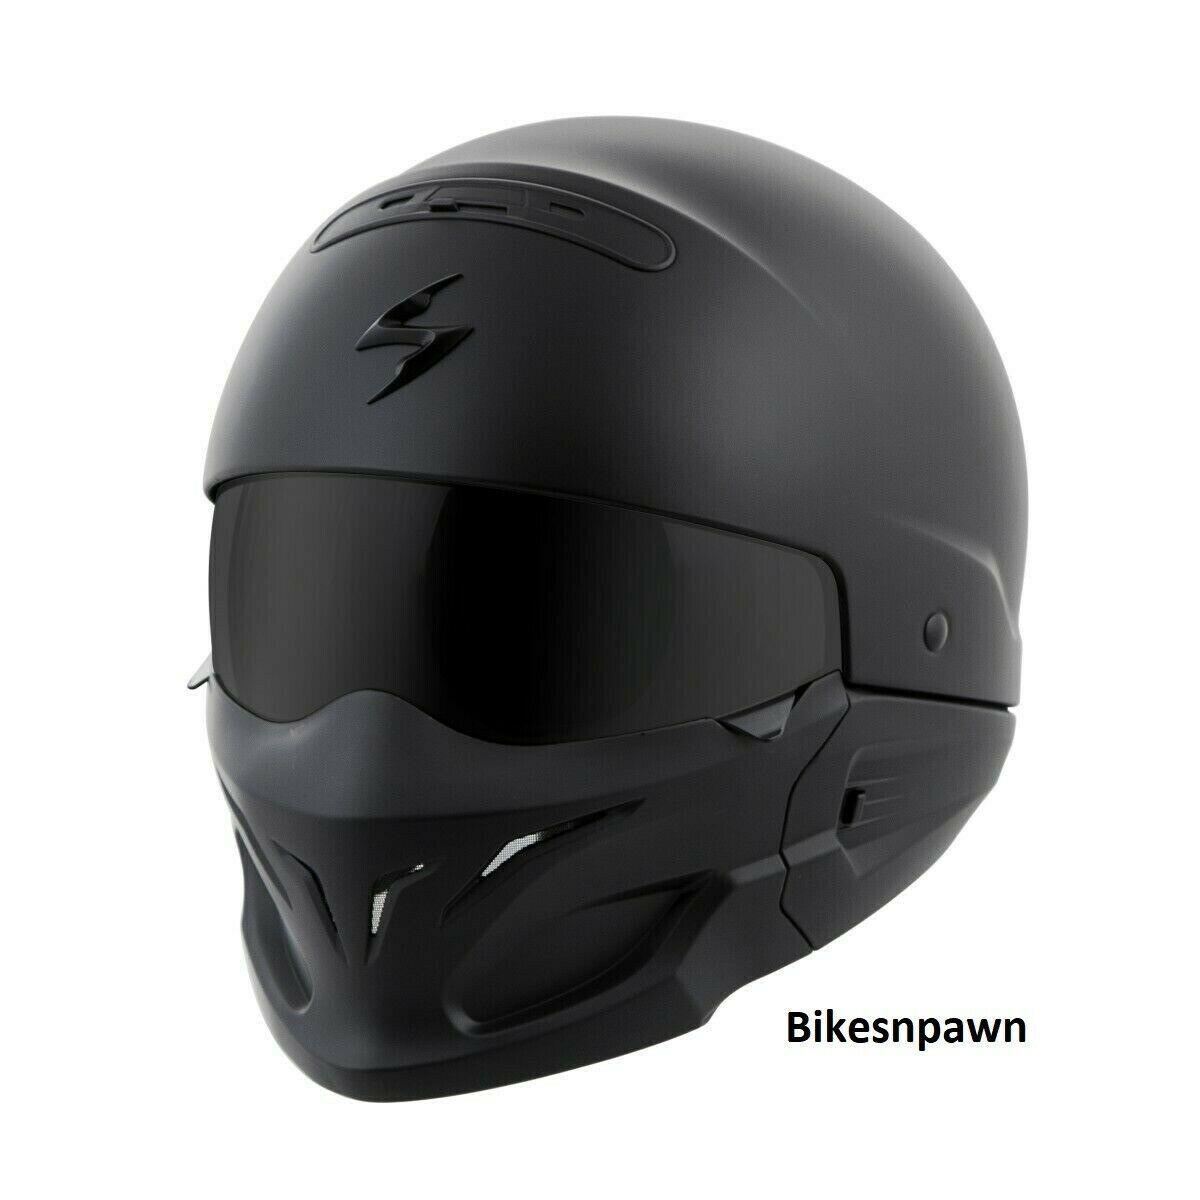 New Size M Scorpion EXO Covert Matt Black 3 in 1 Motorcycle Helmet DOT